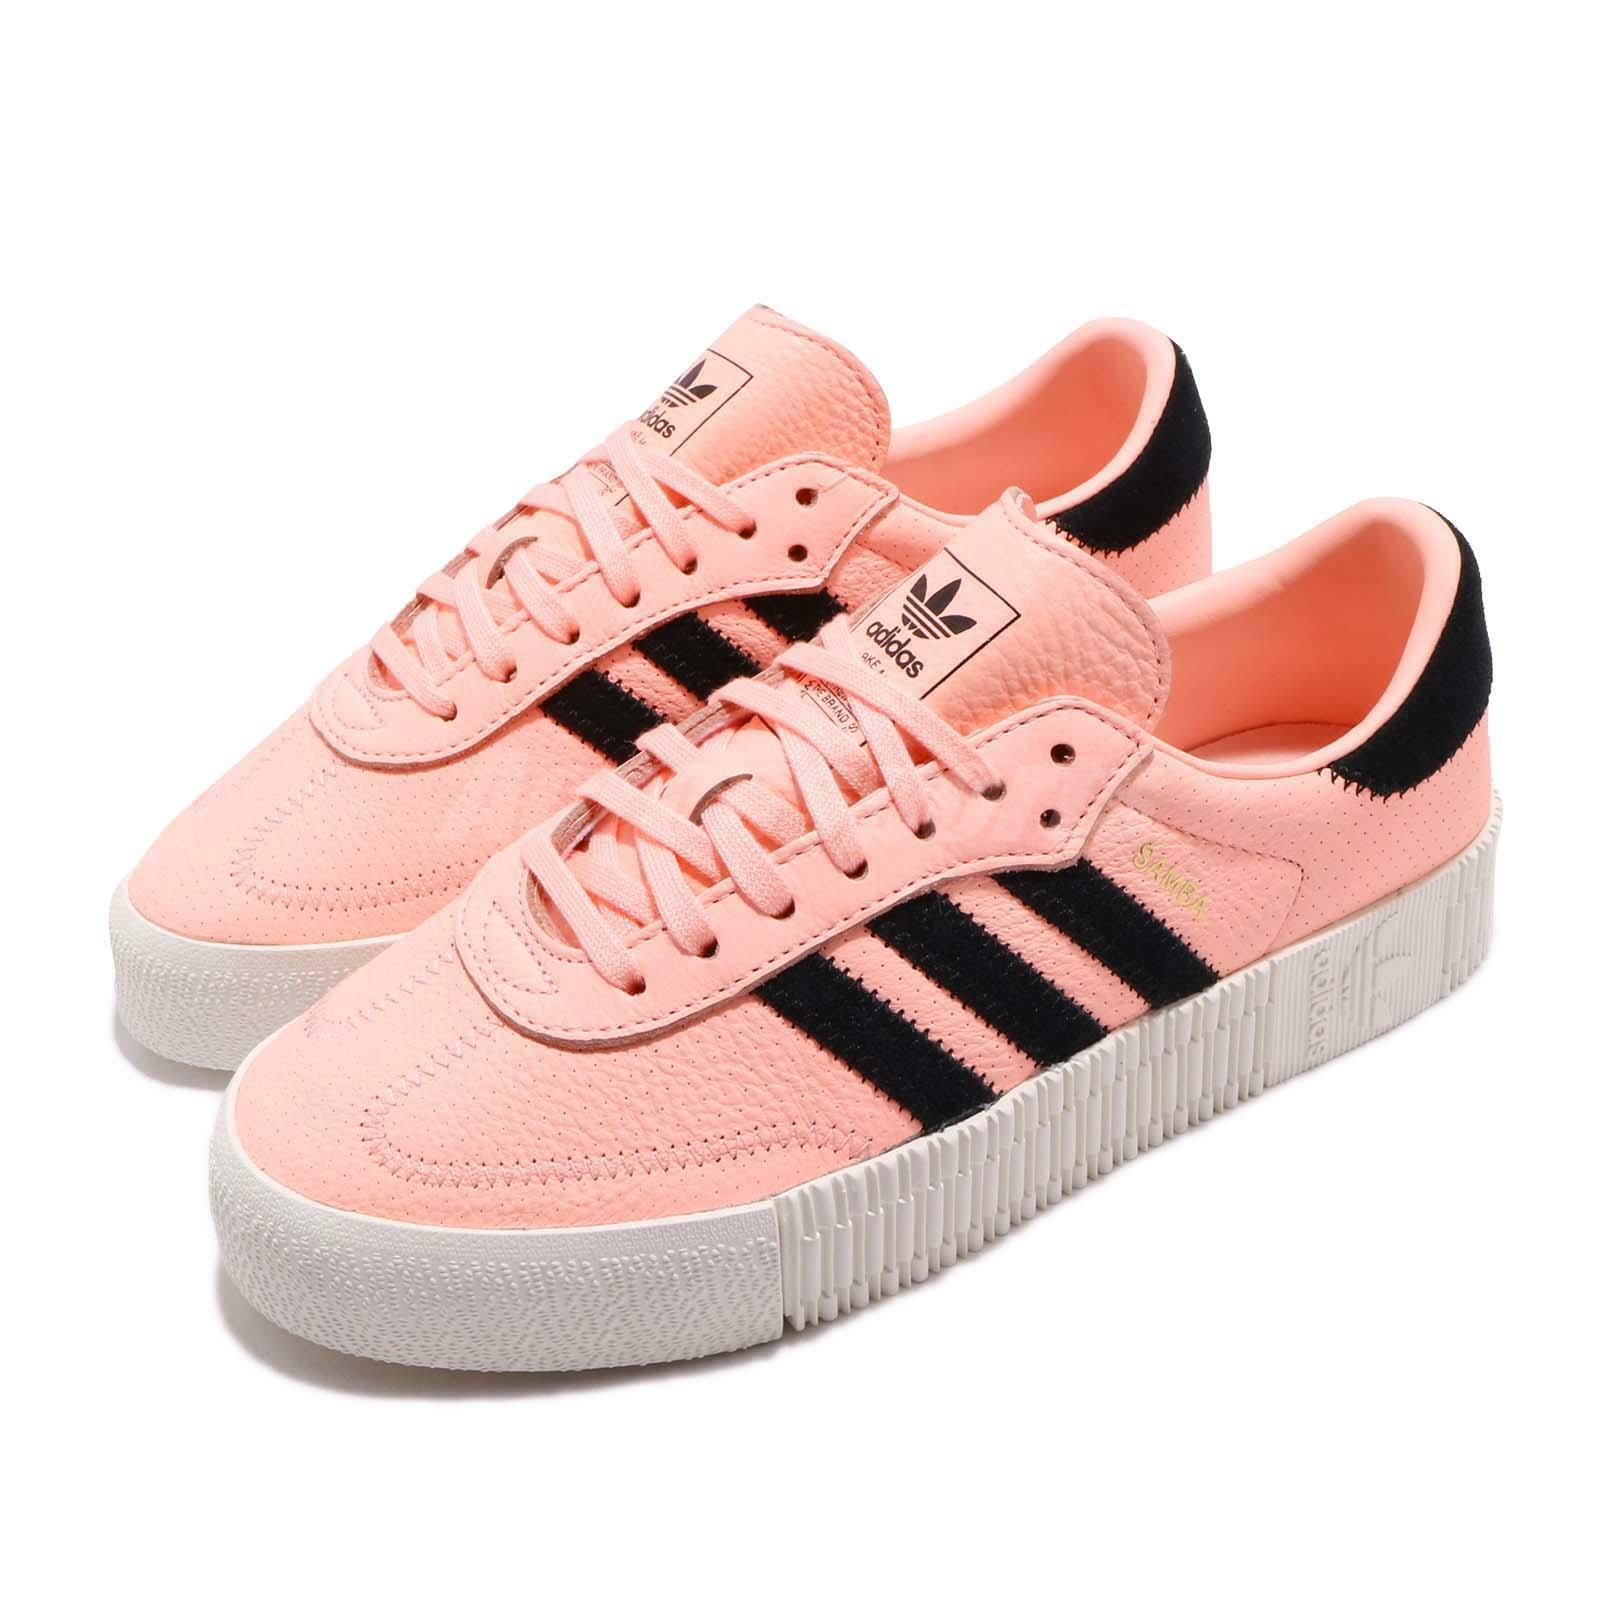 Adidas Originals Sambapink W orange Black Off White Women Platform shoes F34240